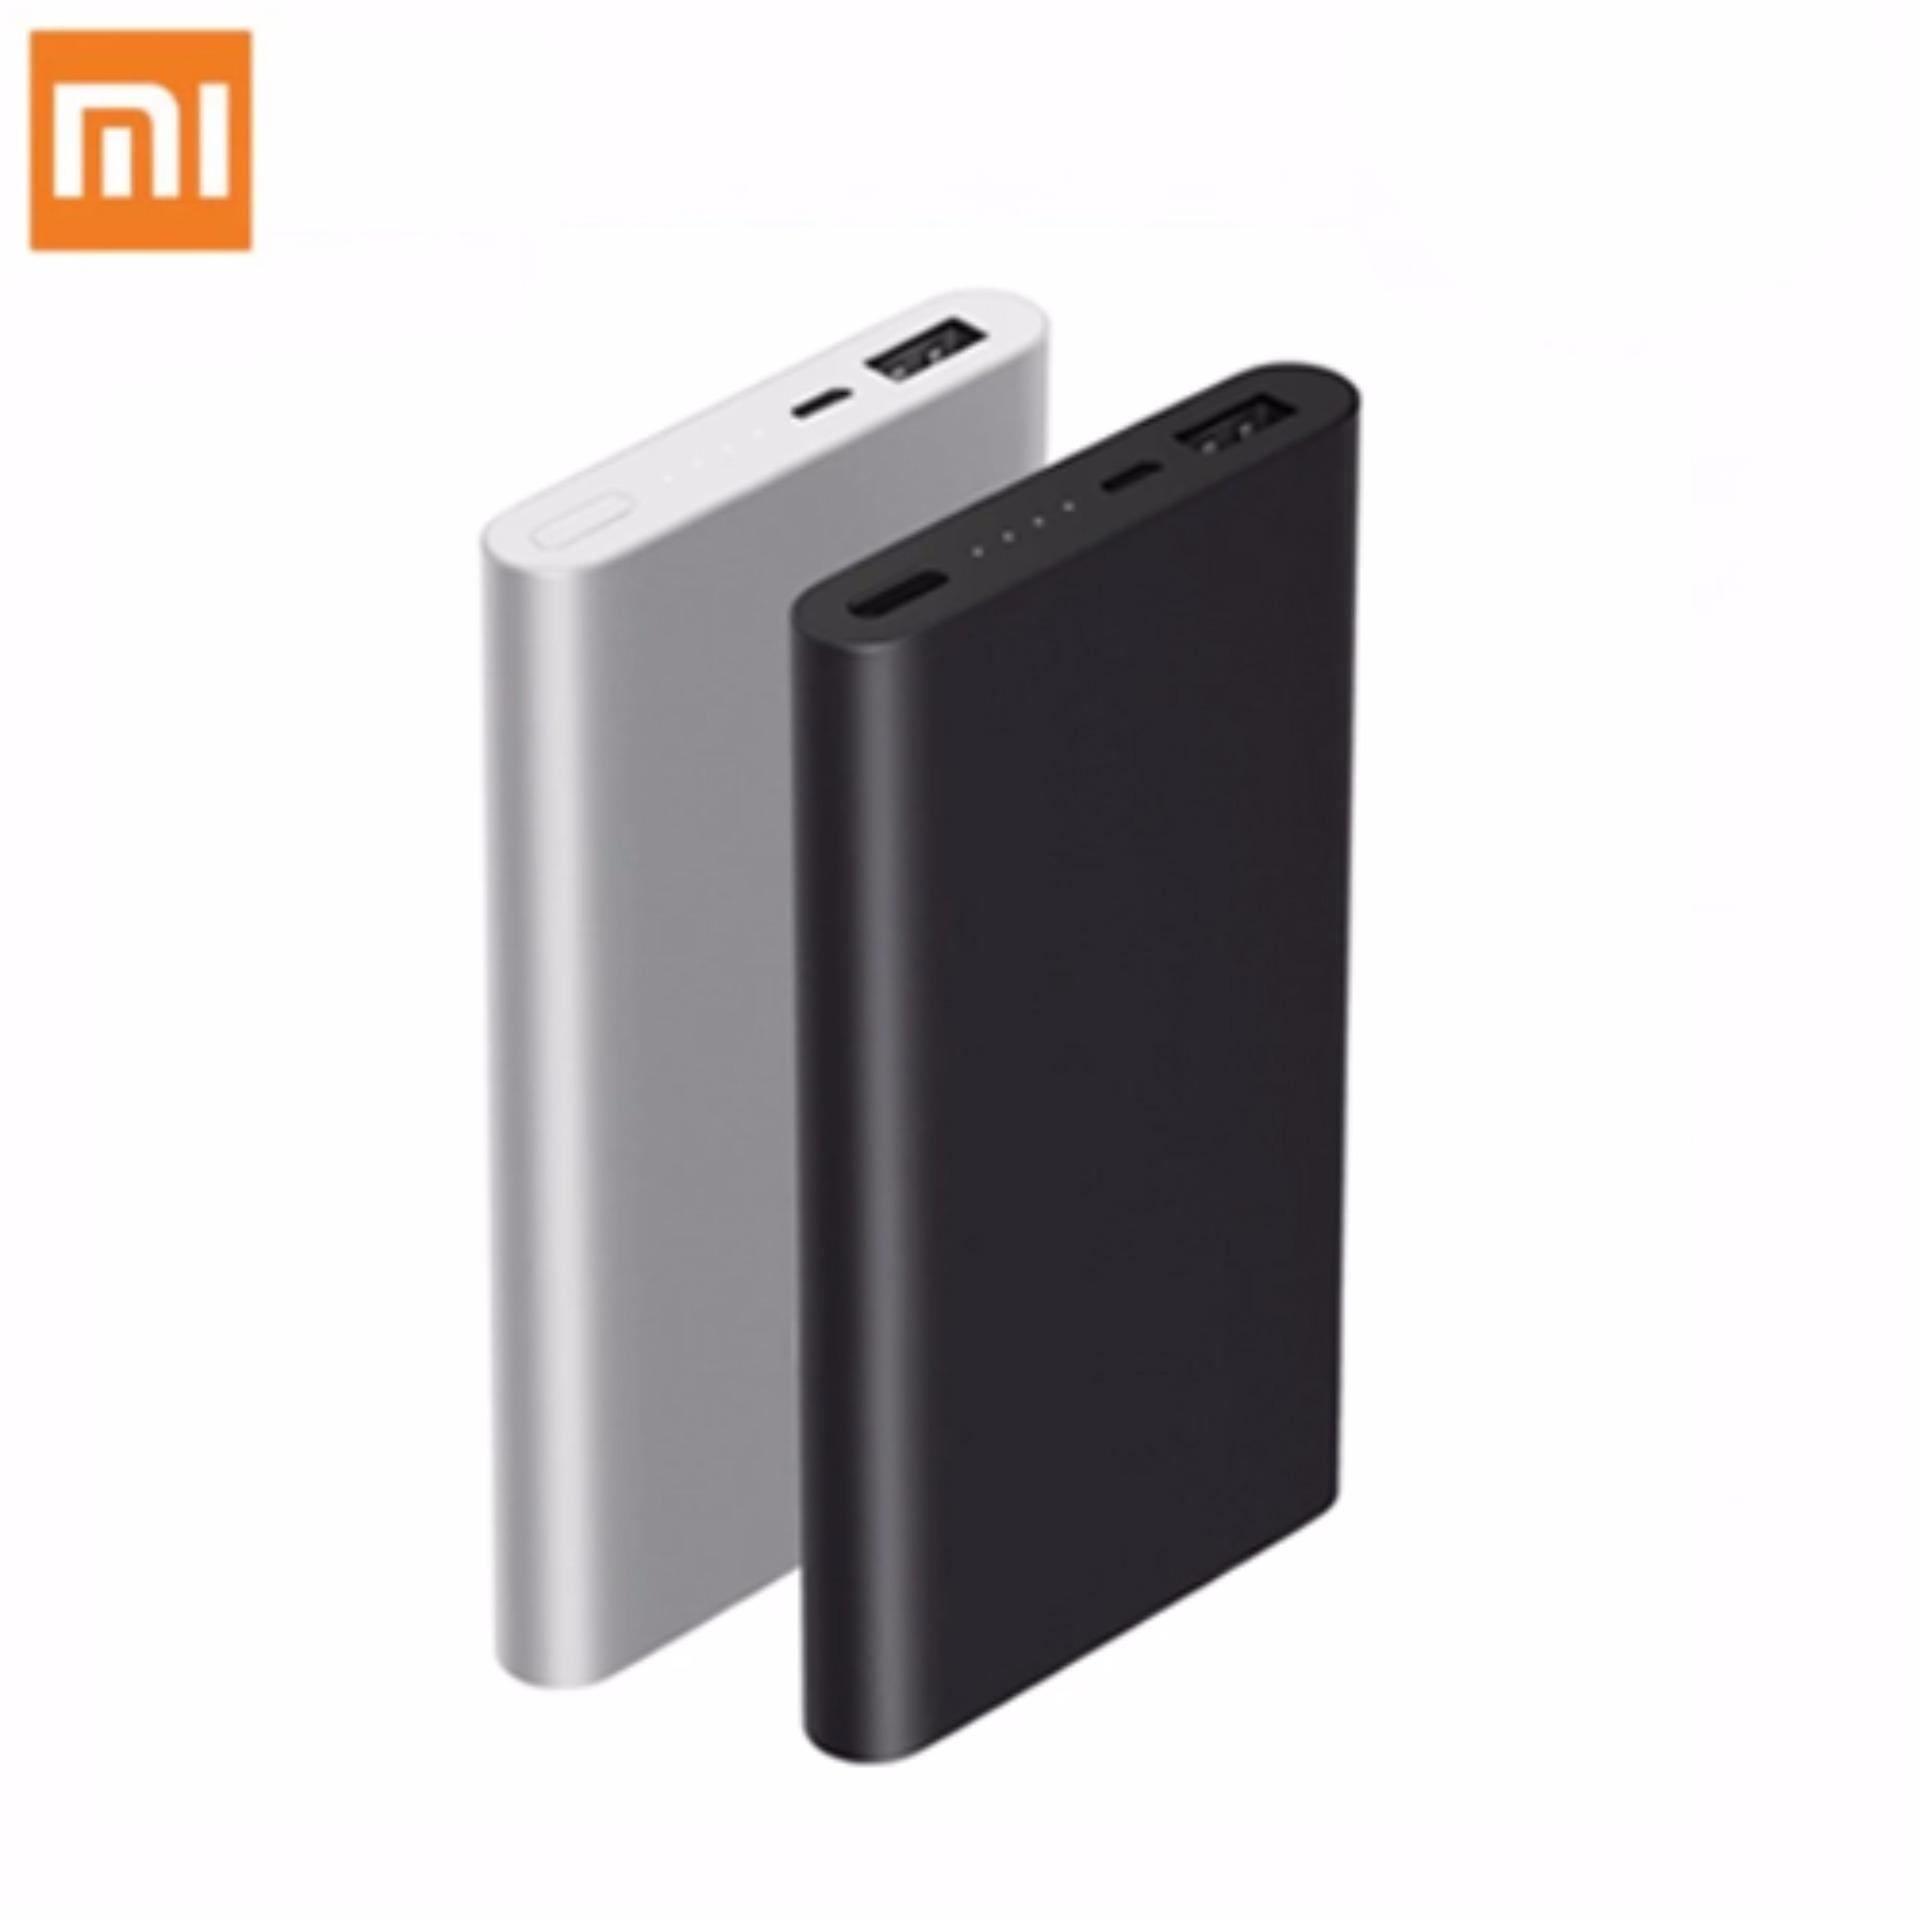 Beli Xiaomi Mi Power Bank 10 000Mah 2 Fast Charging Generasi 2 Hitam Cicilan